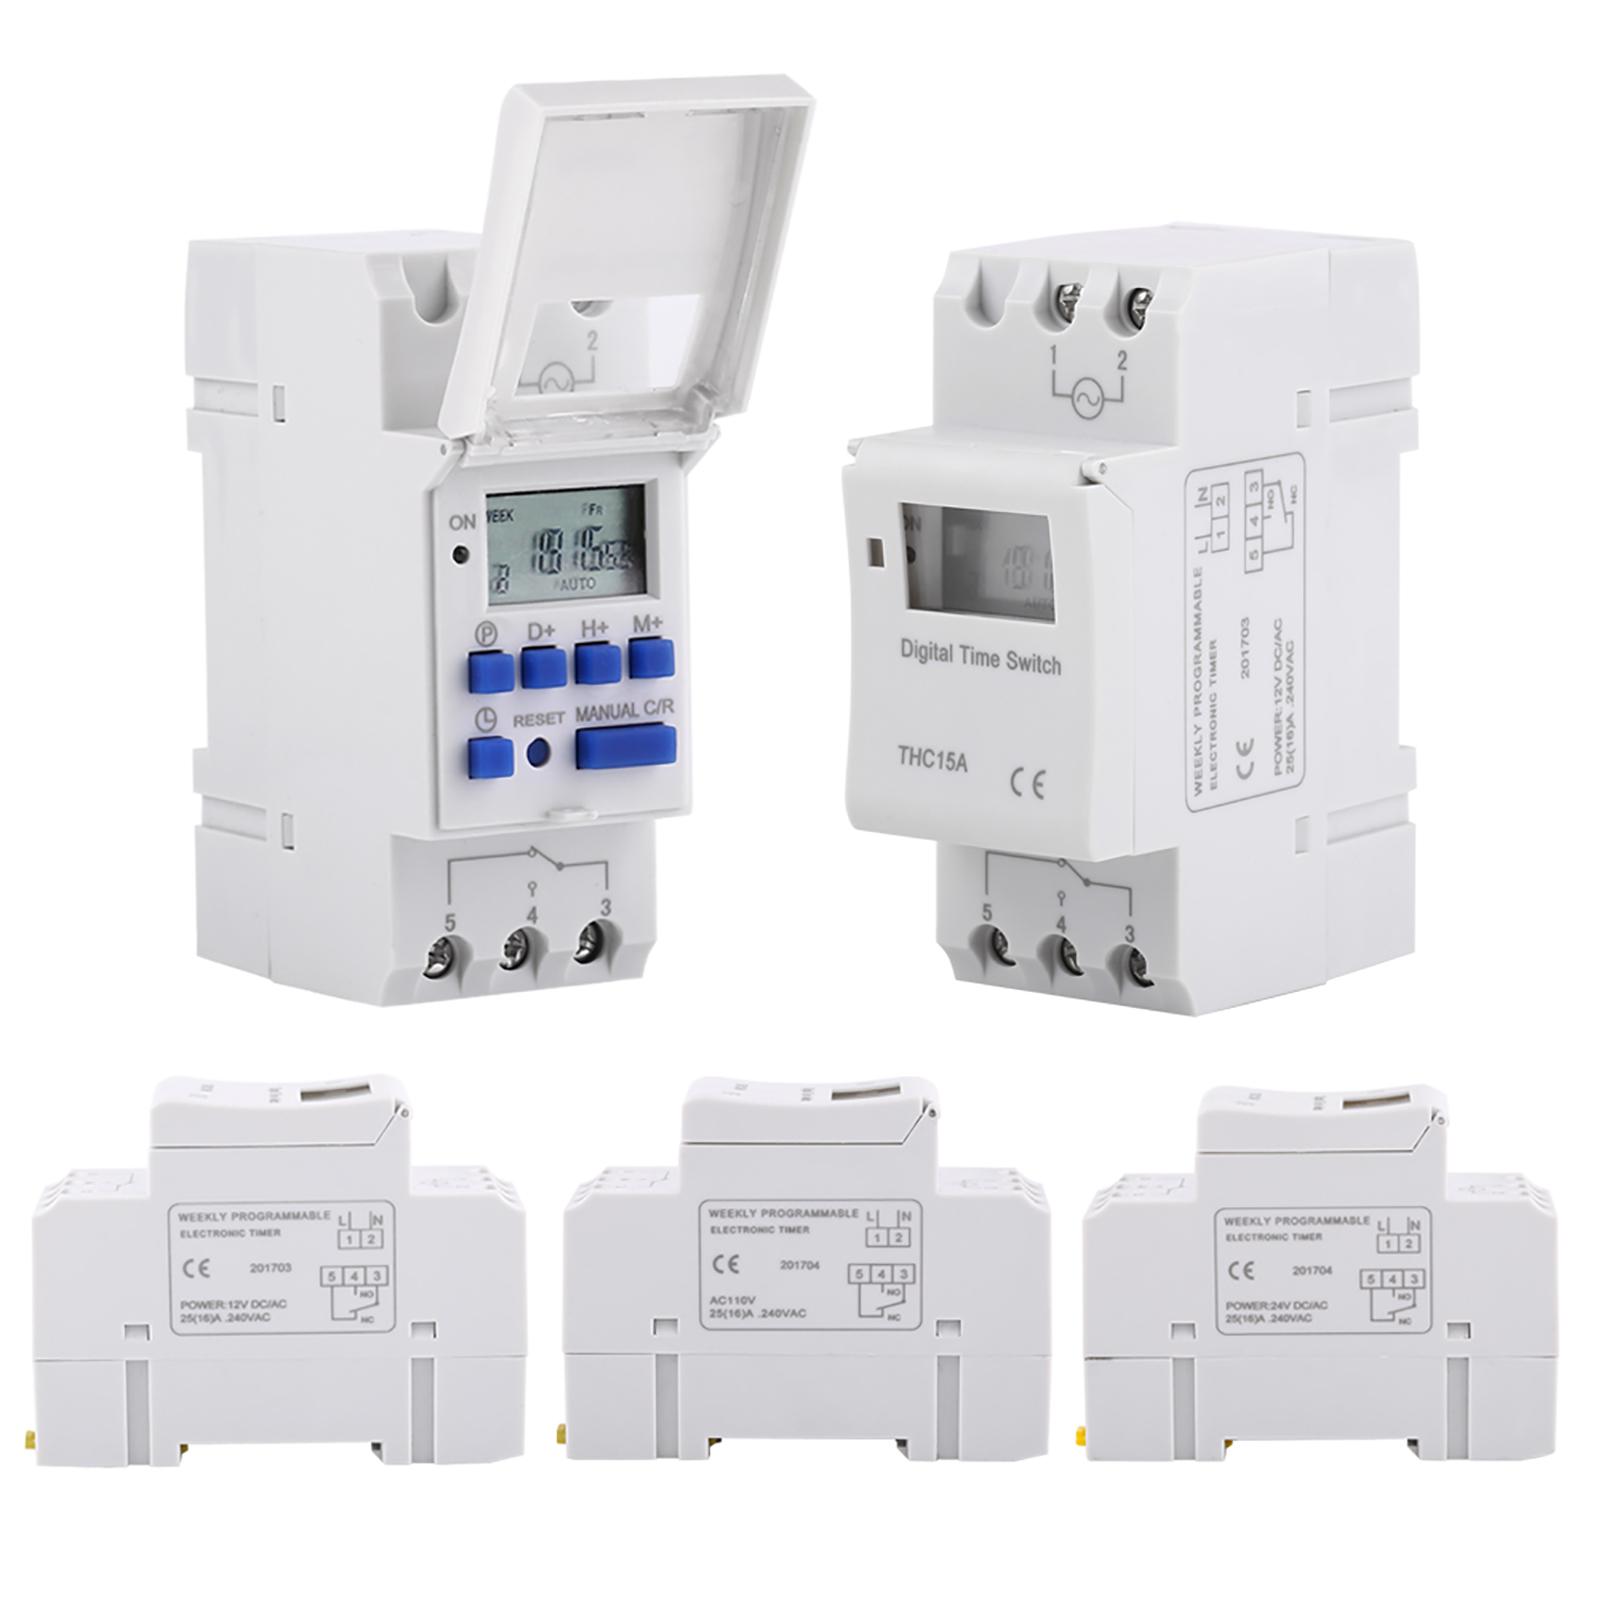 Thc15a Din Rail Mounting Digital Programmable Timer Switch 12v 24v Circuit Breaker Ebay Image